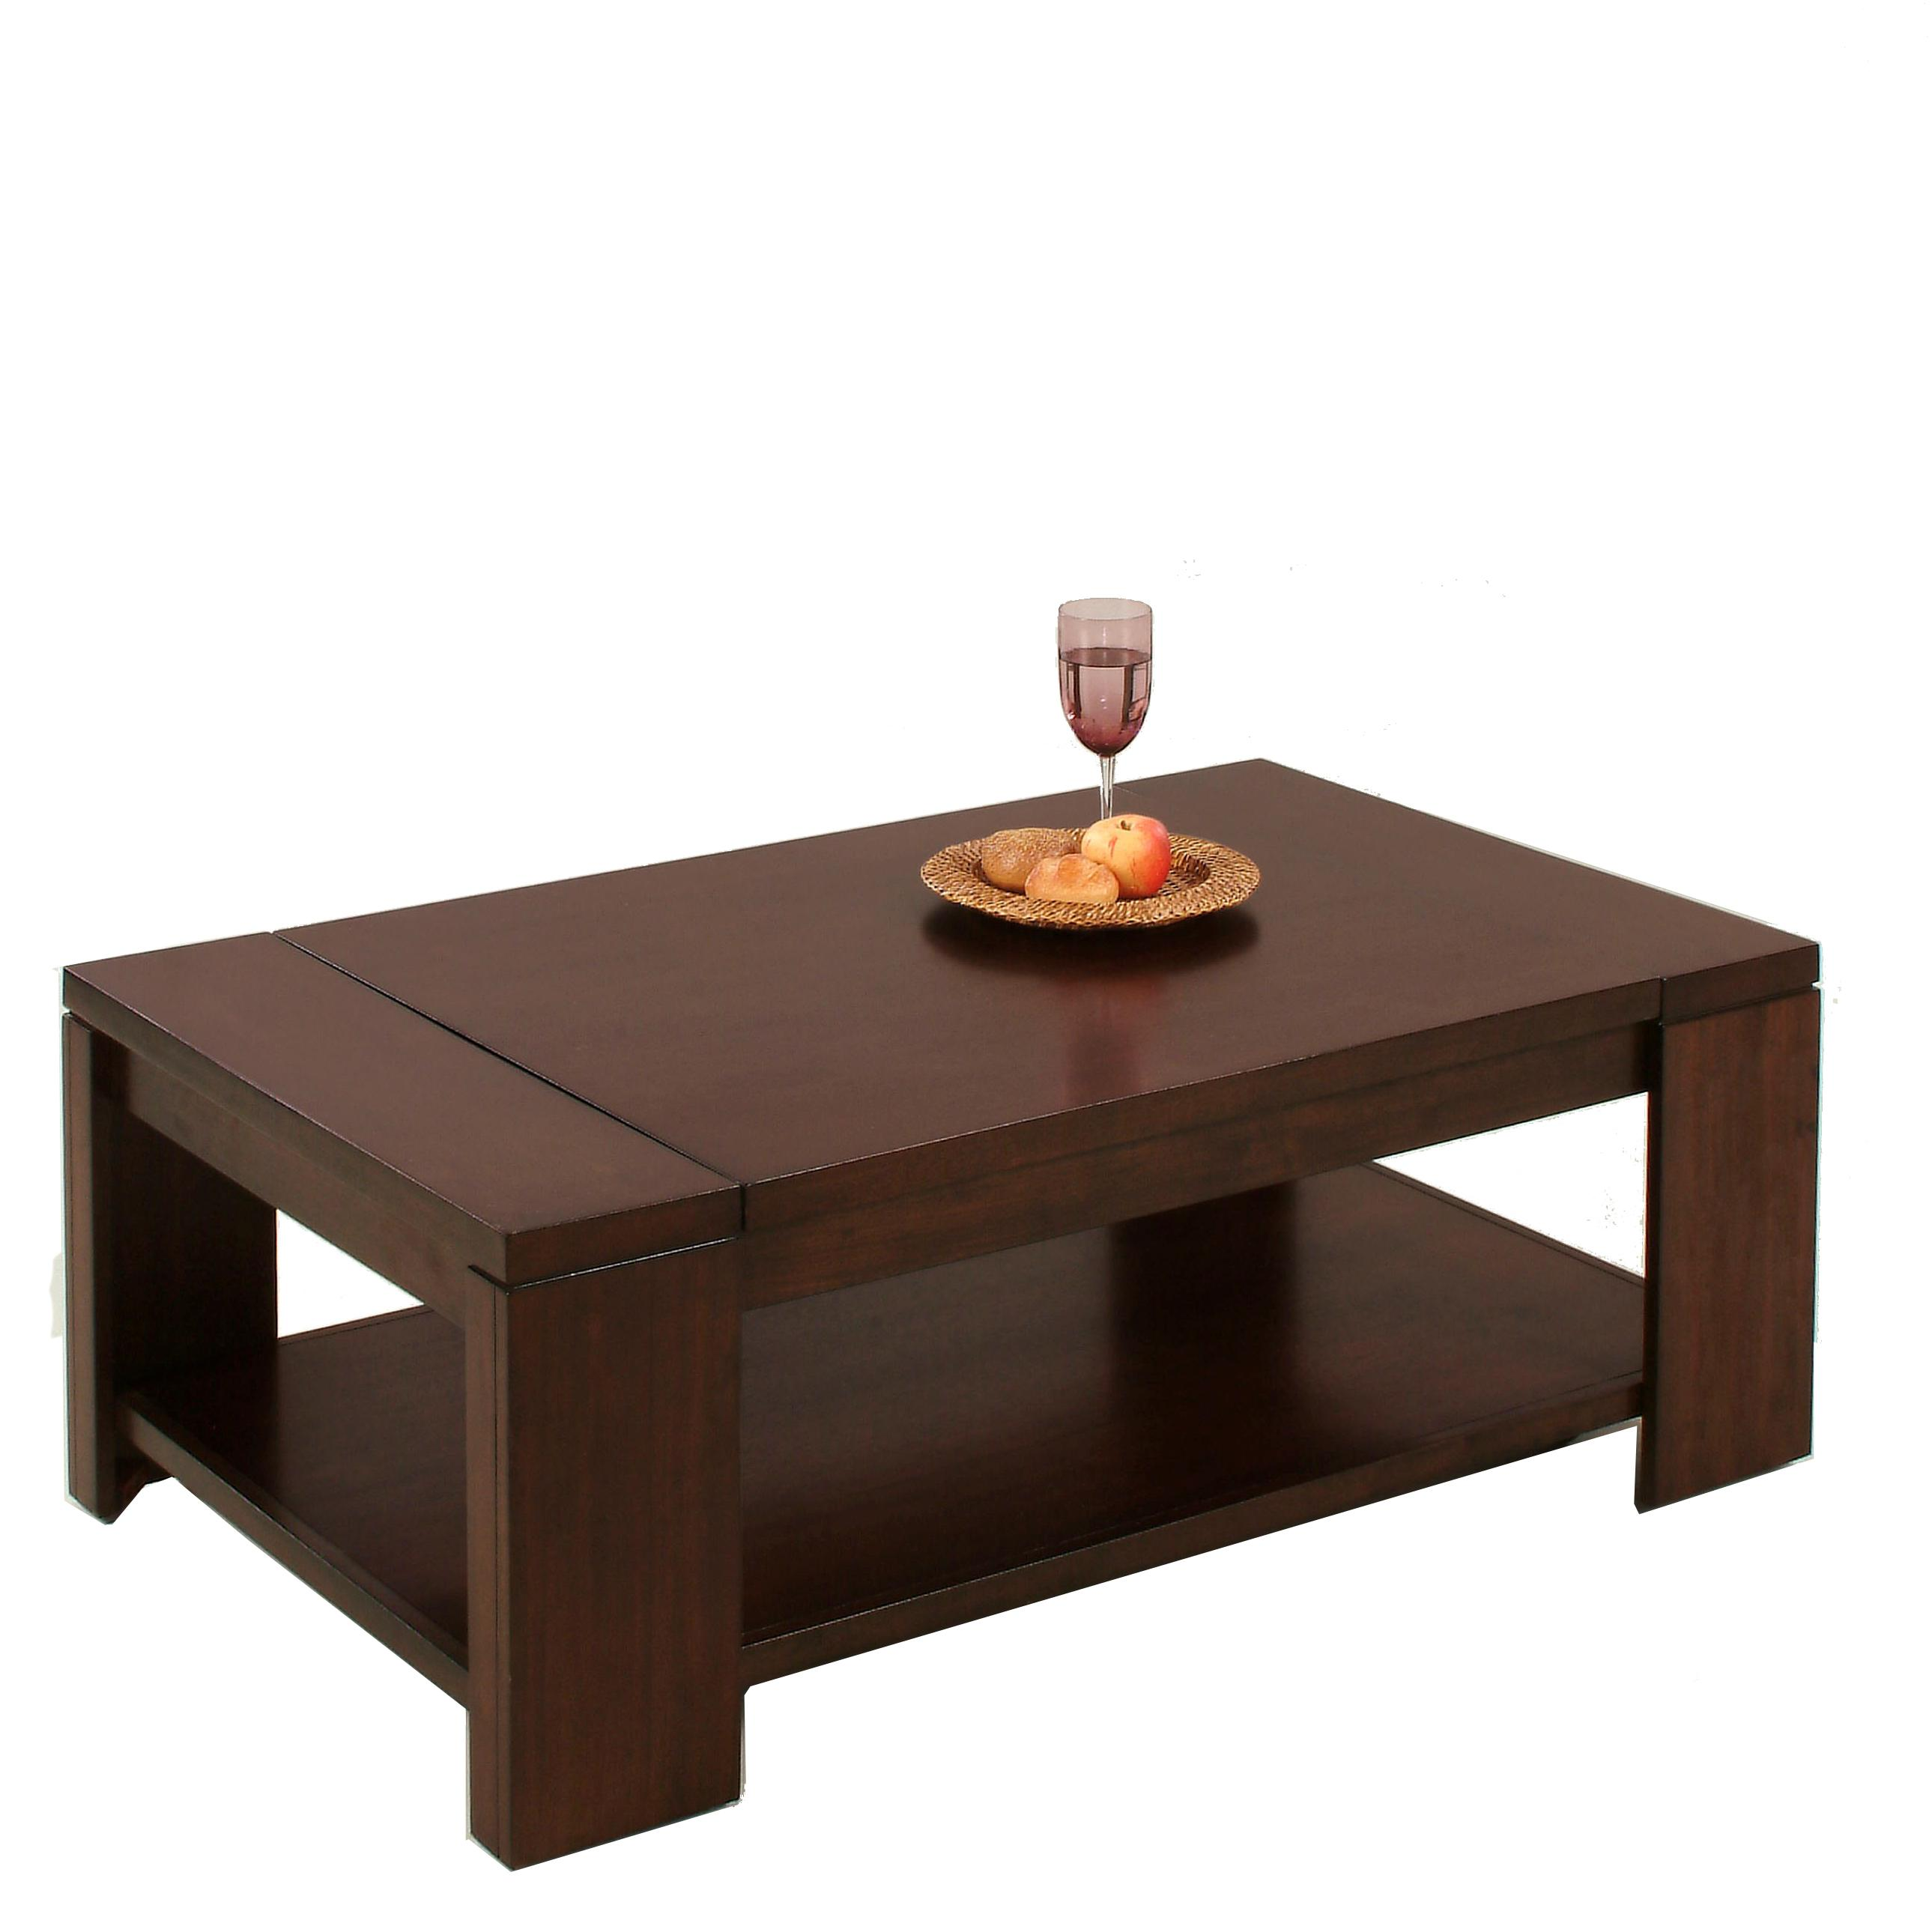 Waverly Rectangular Cocktail Table by Progressive Furniture at Bullard Furniture